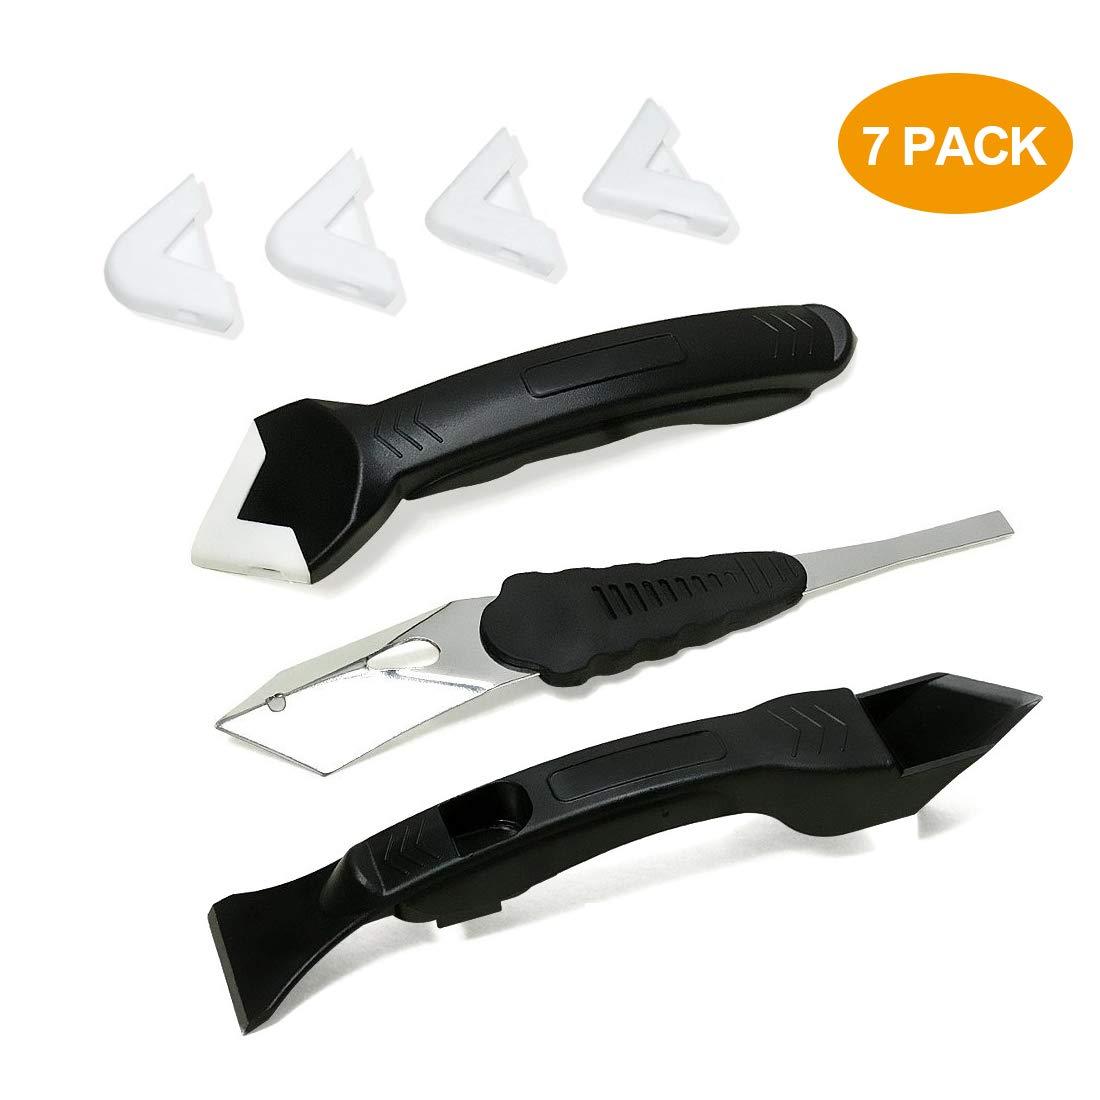 Rascador de silicona 3 en 1, kit de herramienta de rascador de silicona con 4 almohadillas reemplazables sellador herramienta para moldear el bañ o o la cocina Jane Choi